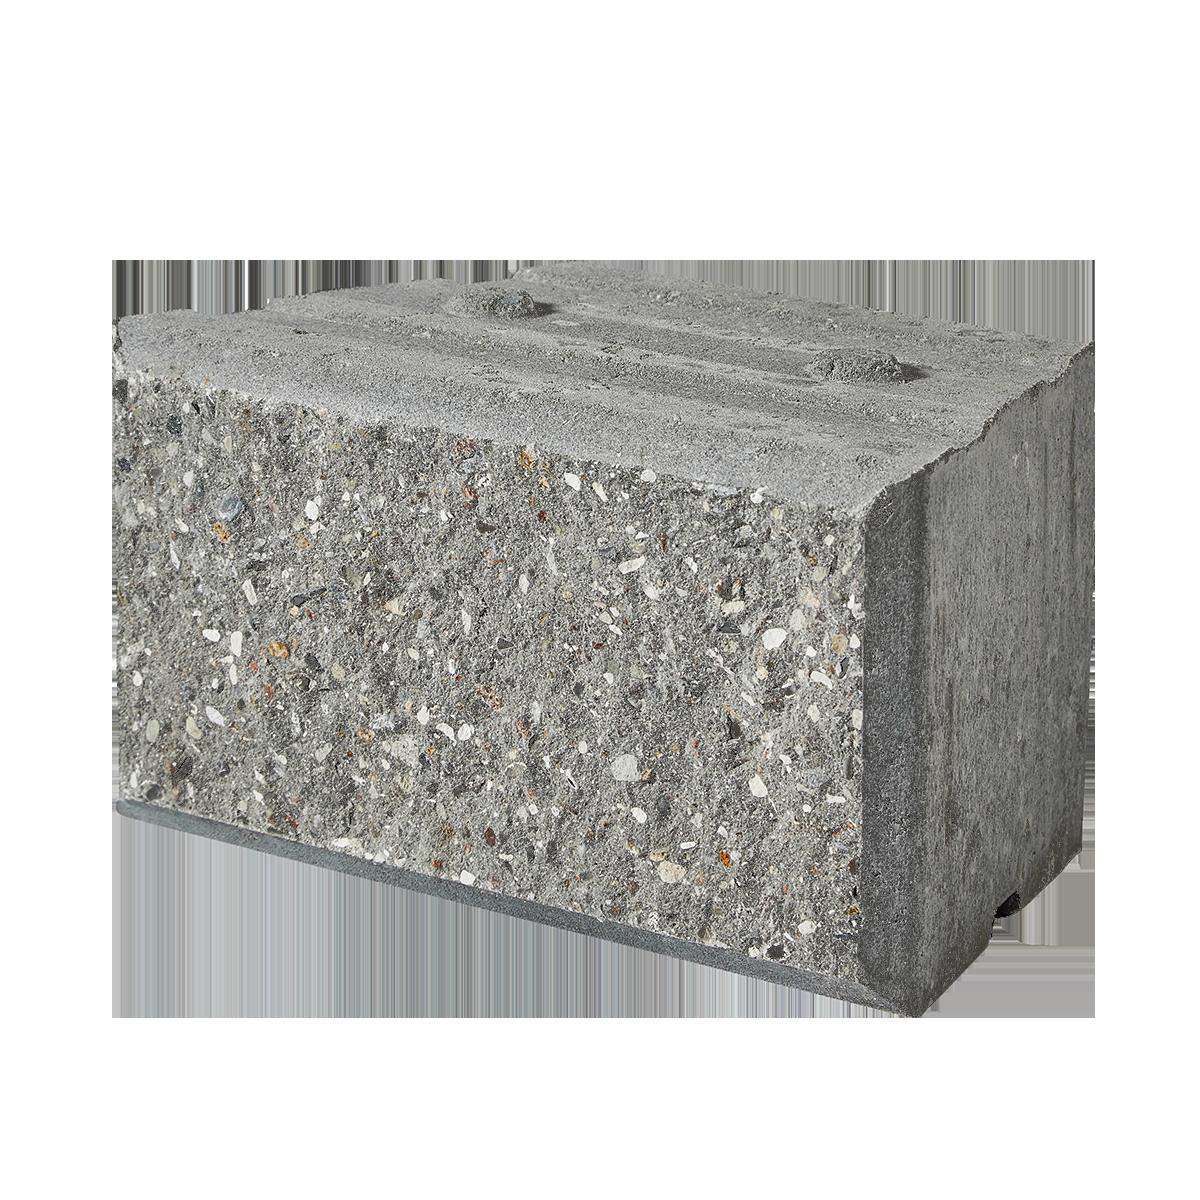 Easyblokke 18/30x18x15 cm Grå Normal